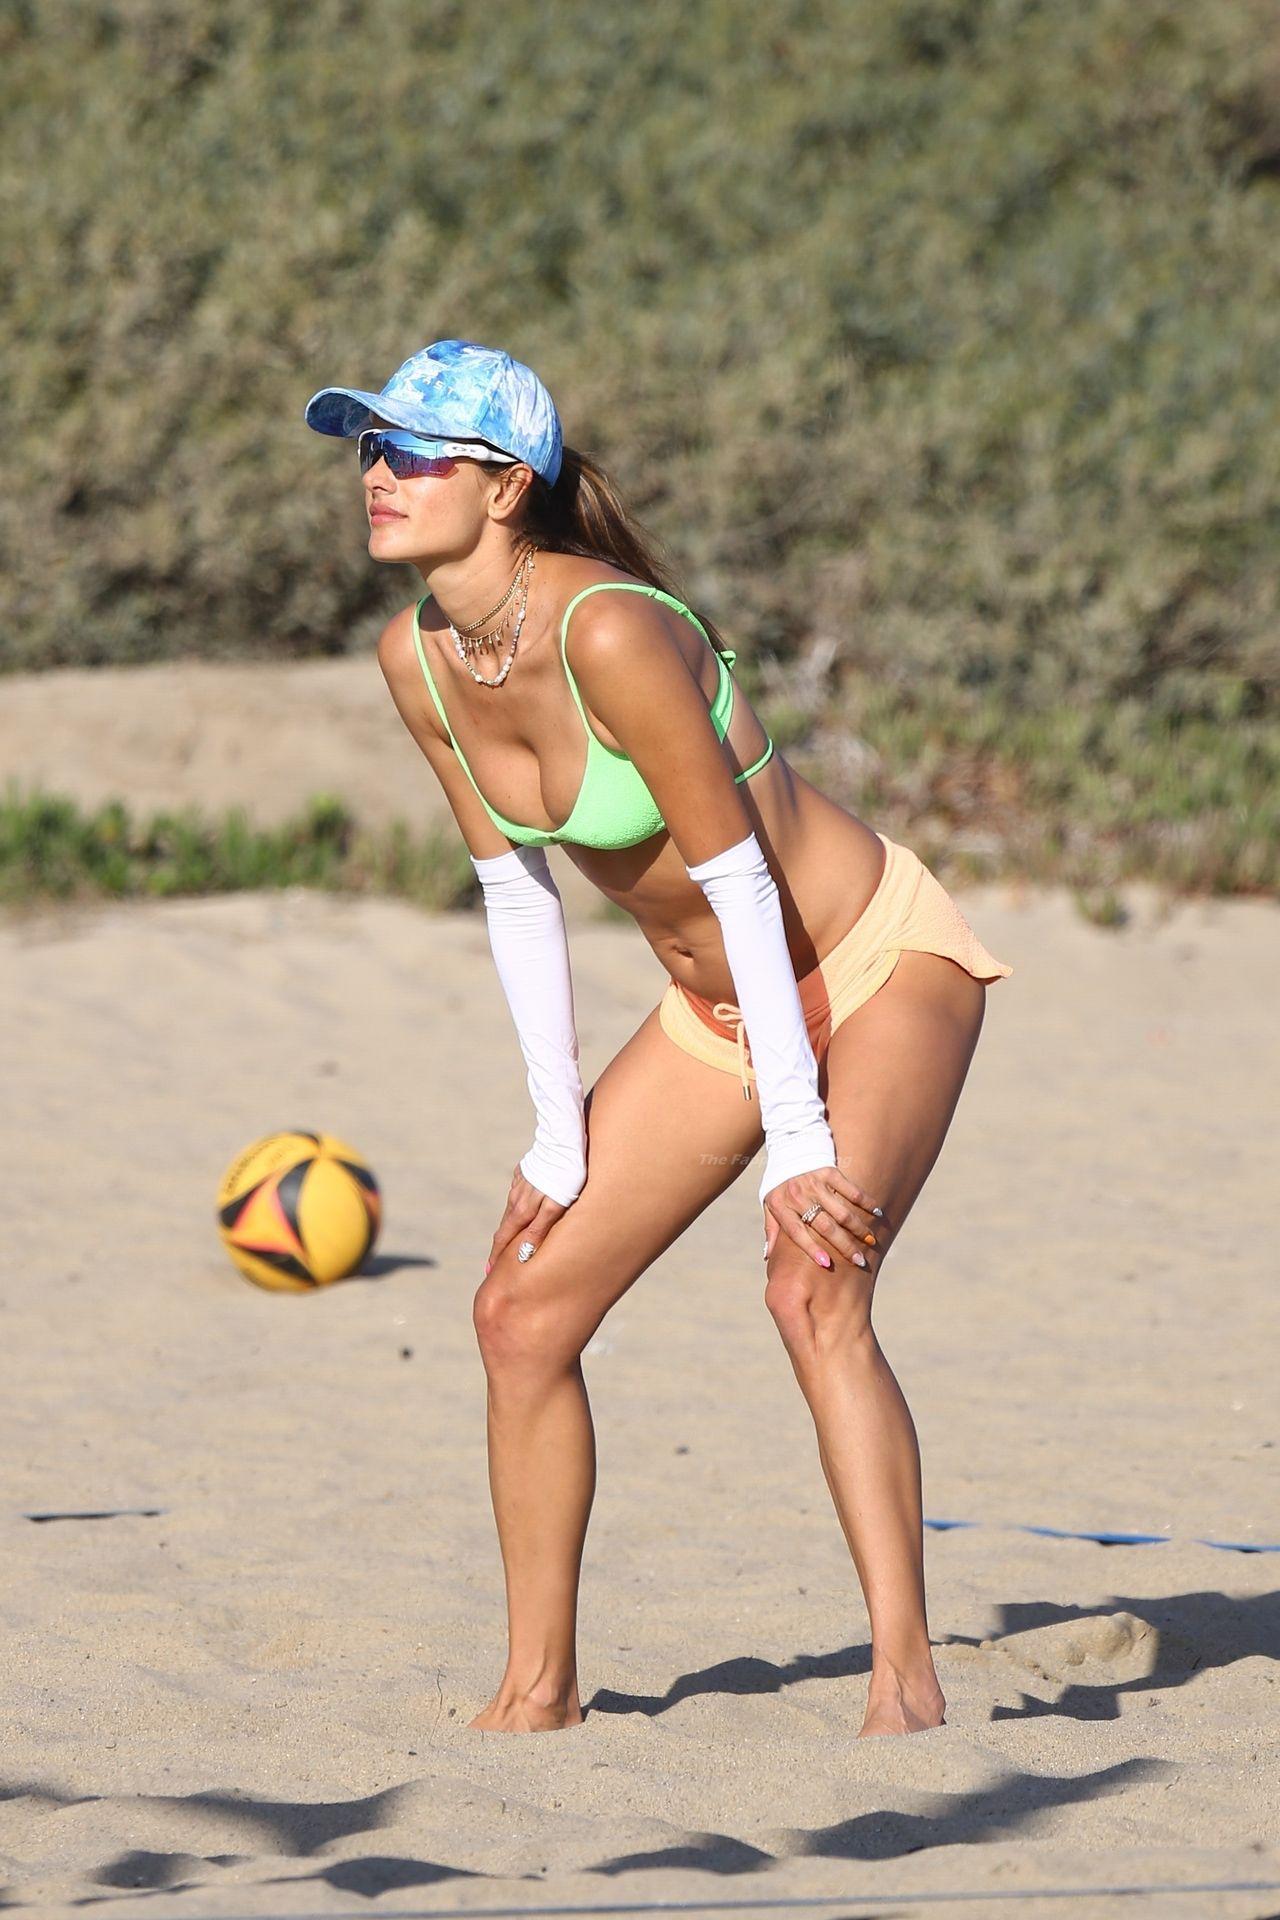 Alessandra-Ambrosio-Sexy-The-Fappening-Blog-1071.jpg